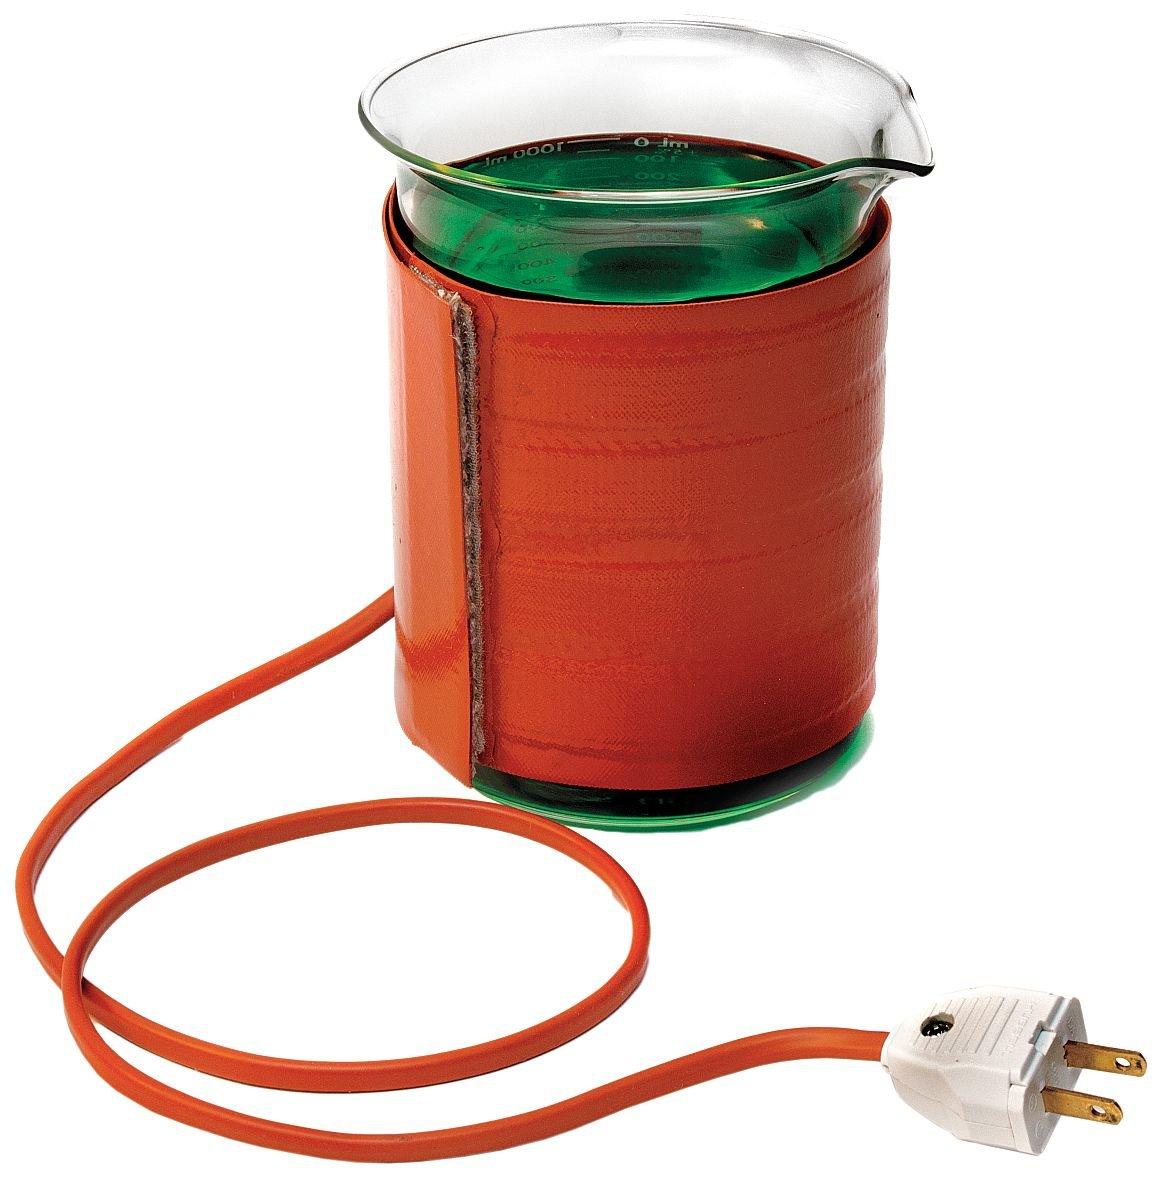 BriskHeat GBH0600-2 Griffin Beaker Heater, 240V, 600 lb.